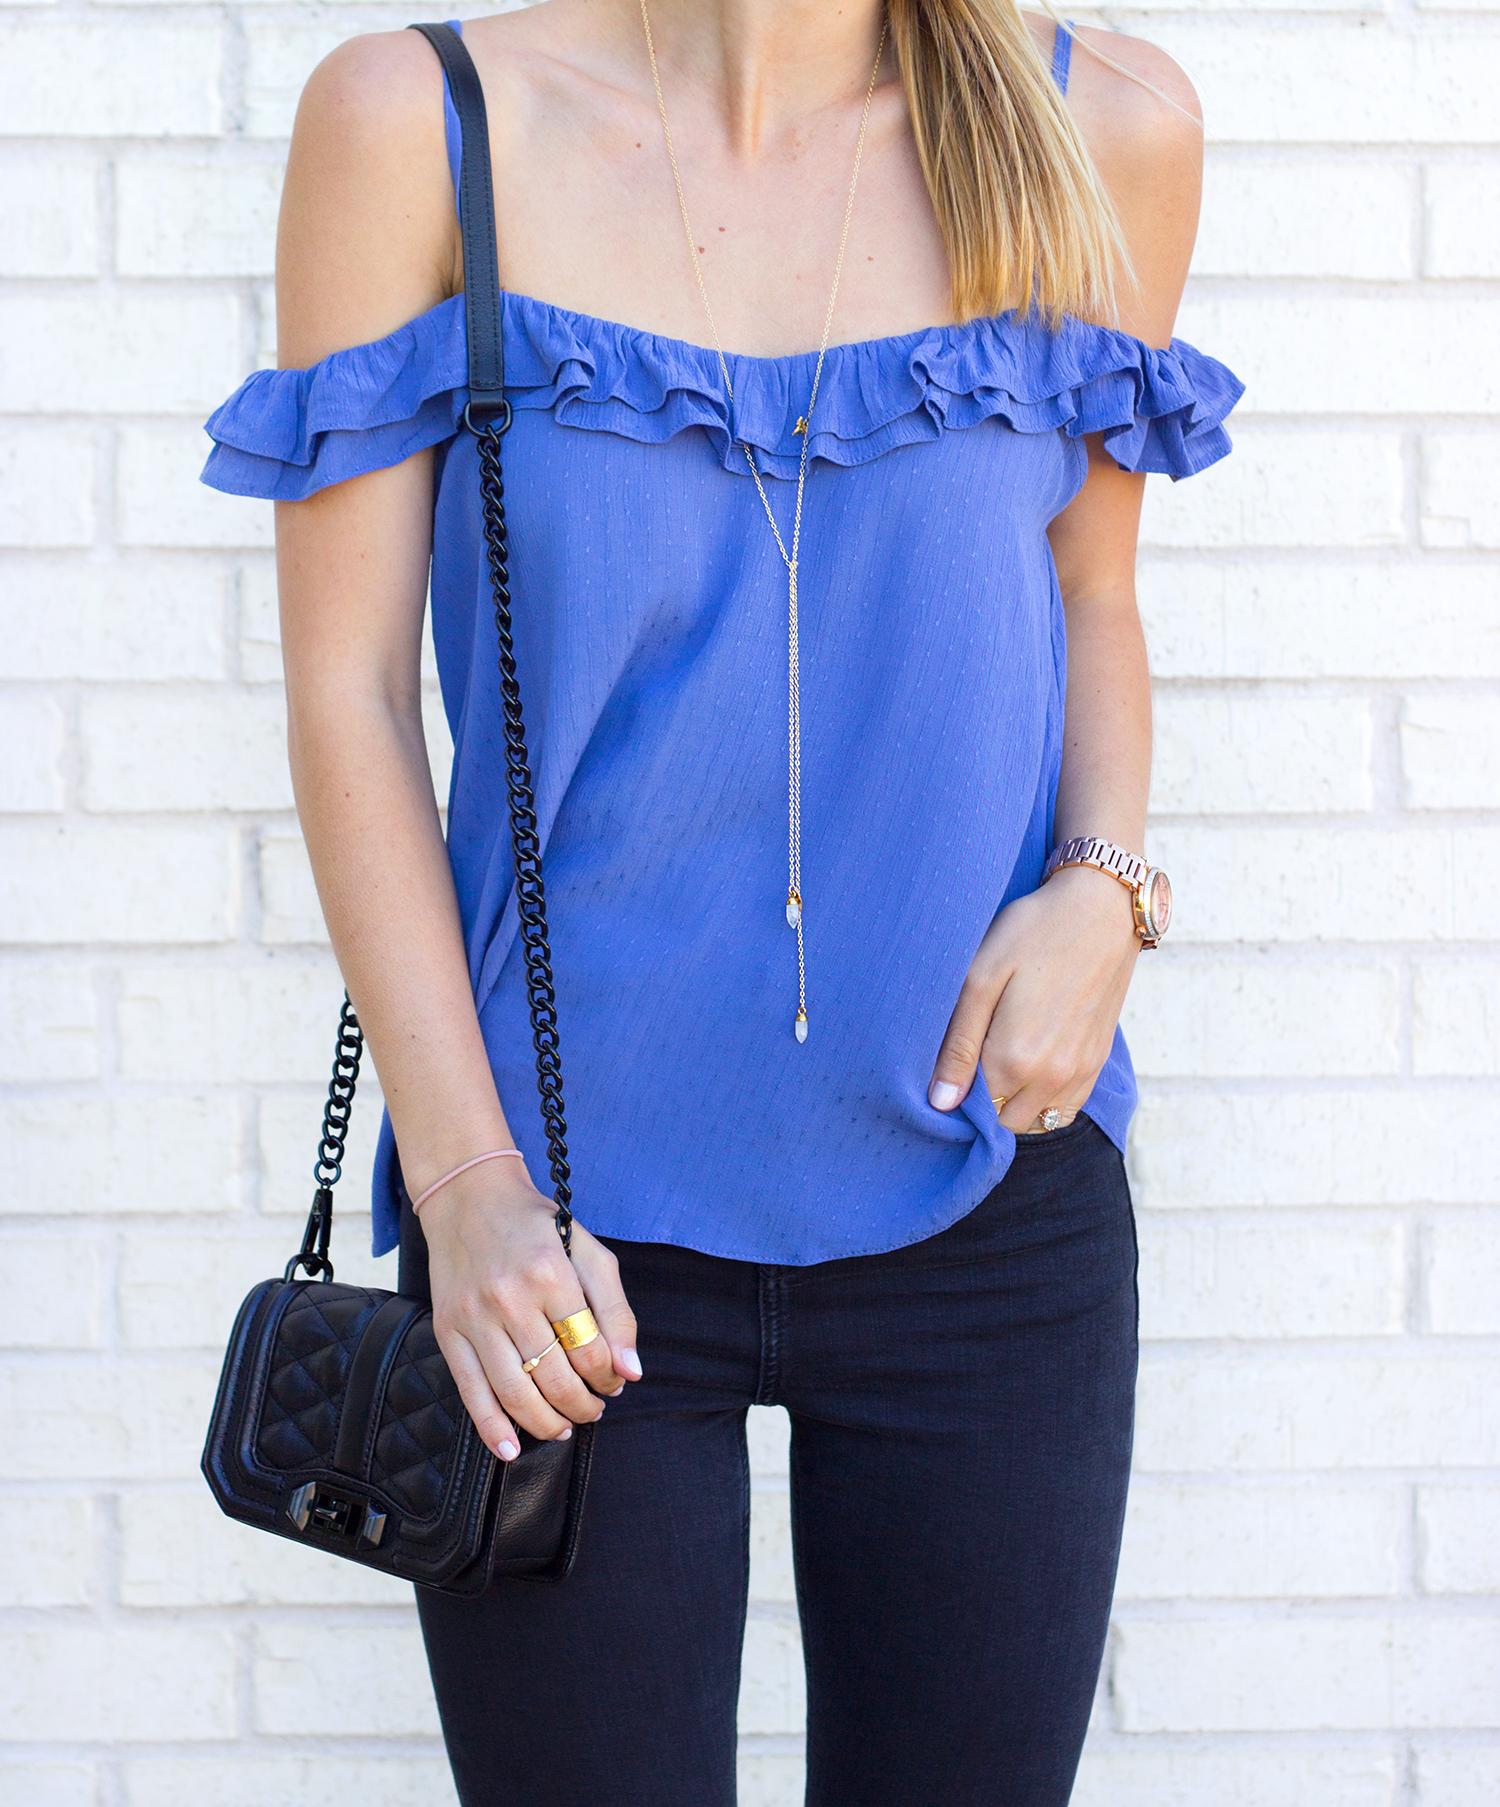 livvyland-blog-olivia-watson-austin-texas-fashion-blogger-topshop-ruffled-off-shoulder-cold-top-black-distressed-skinny-jeans-rebecca-minkoff-mini-love-affair-handbag-7